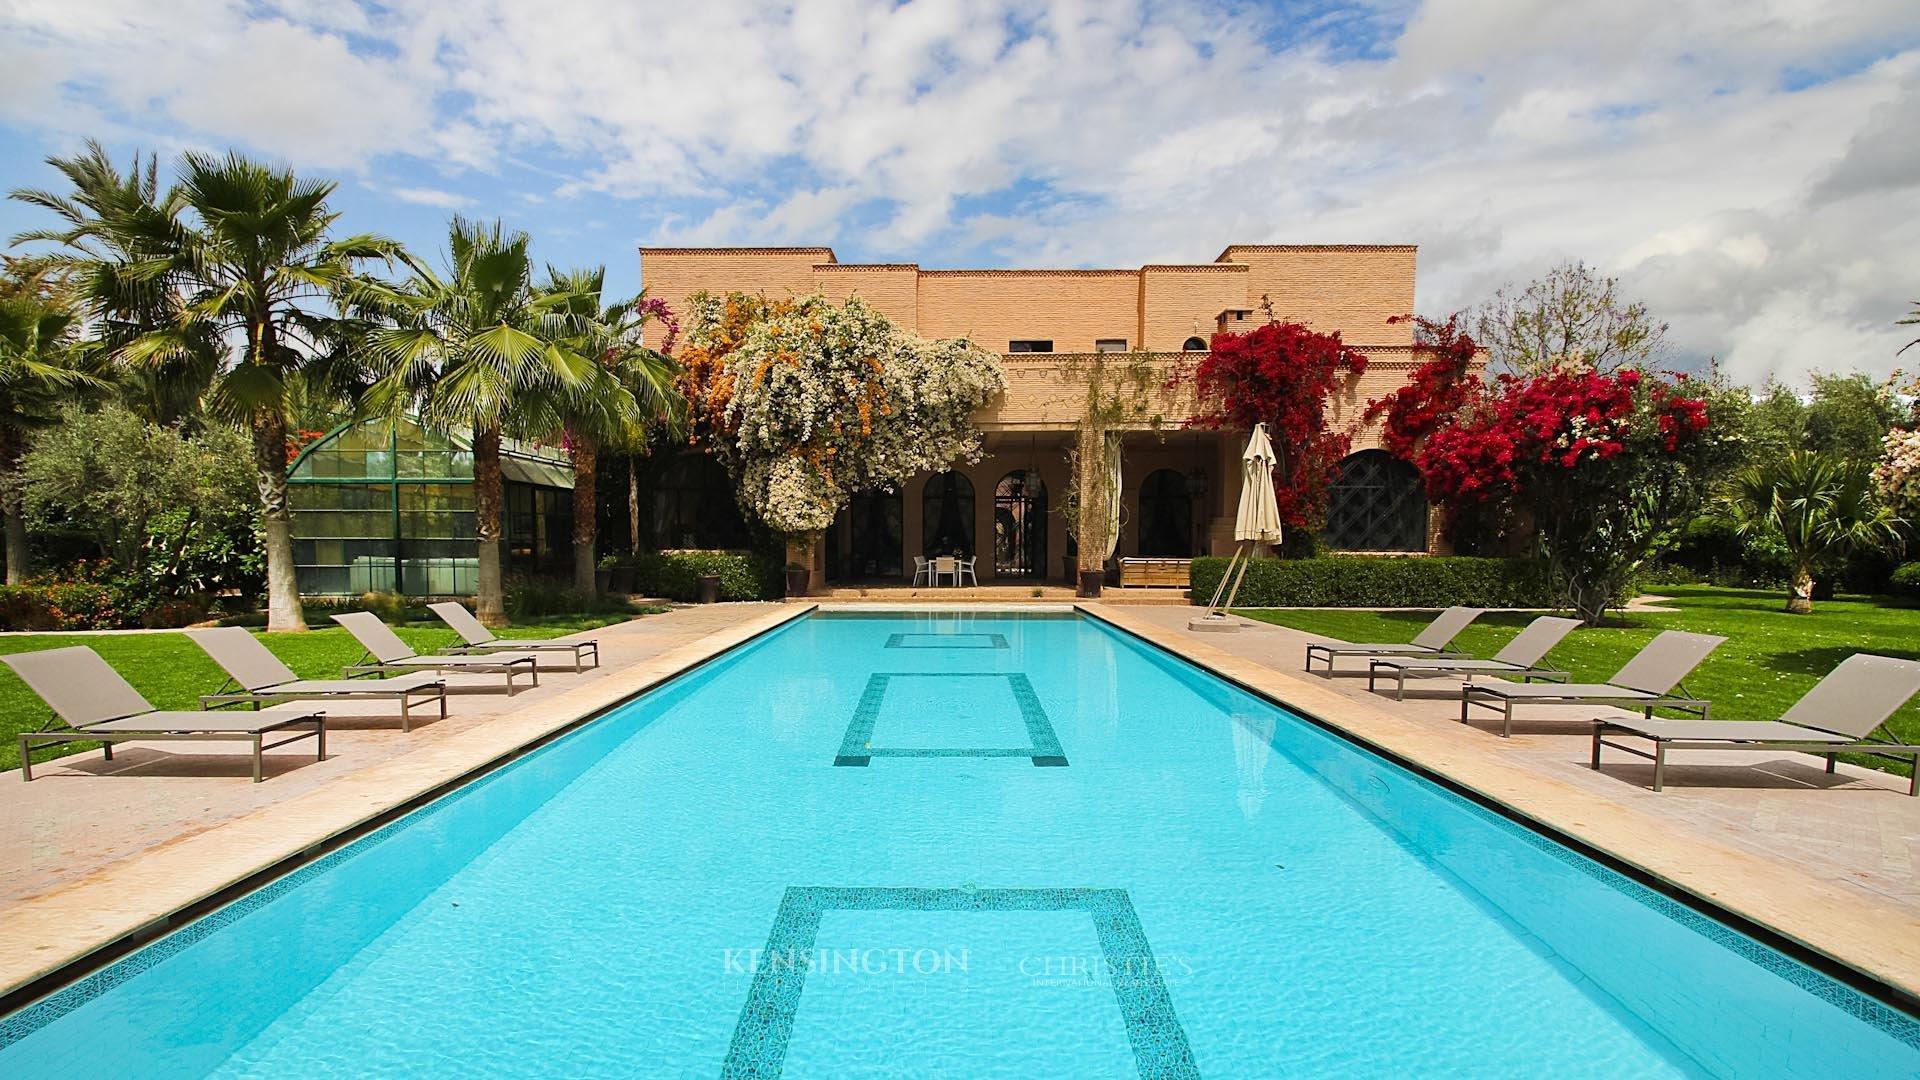 KPPM01202: Villa Sidura Luxury Villa Marrakech Morocco